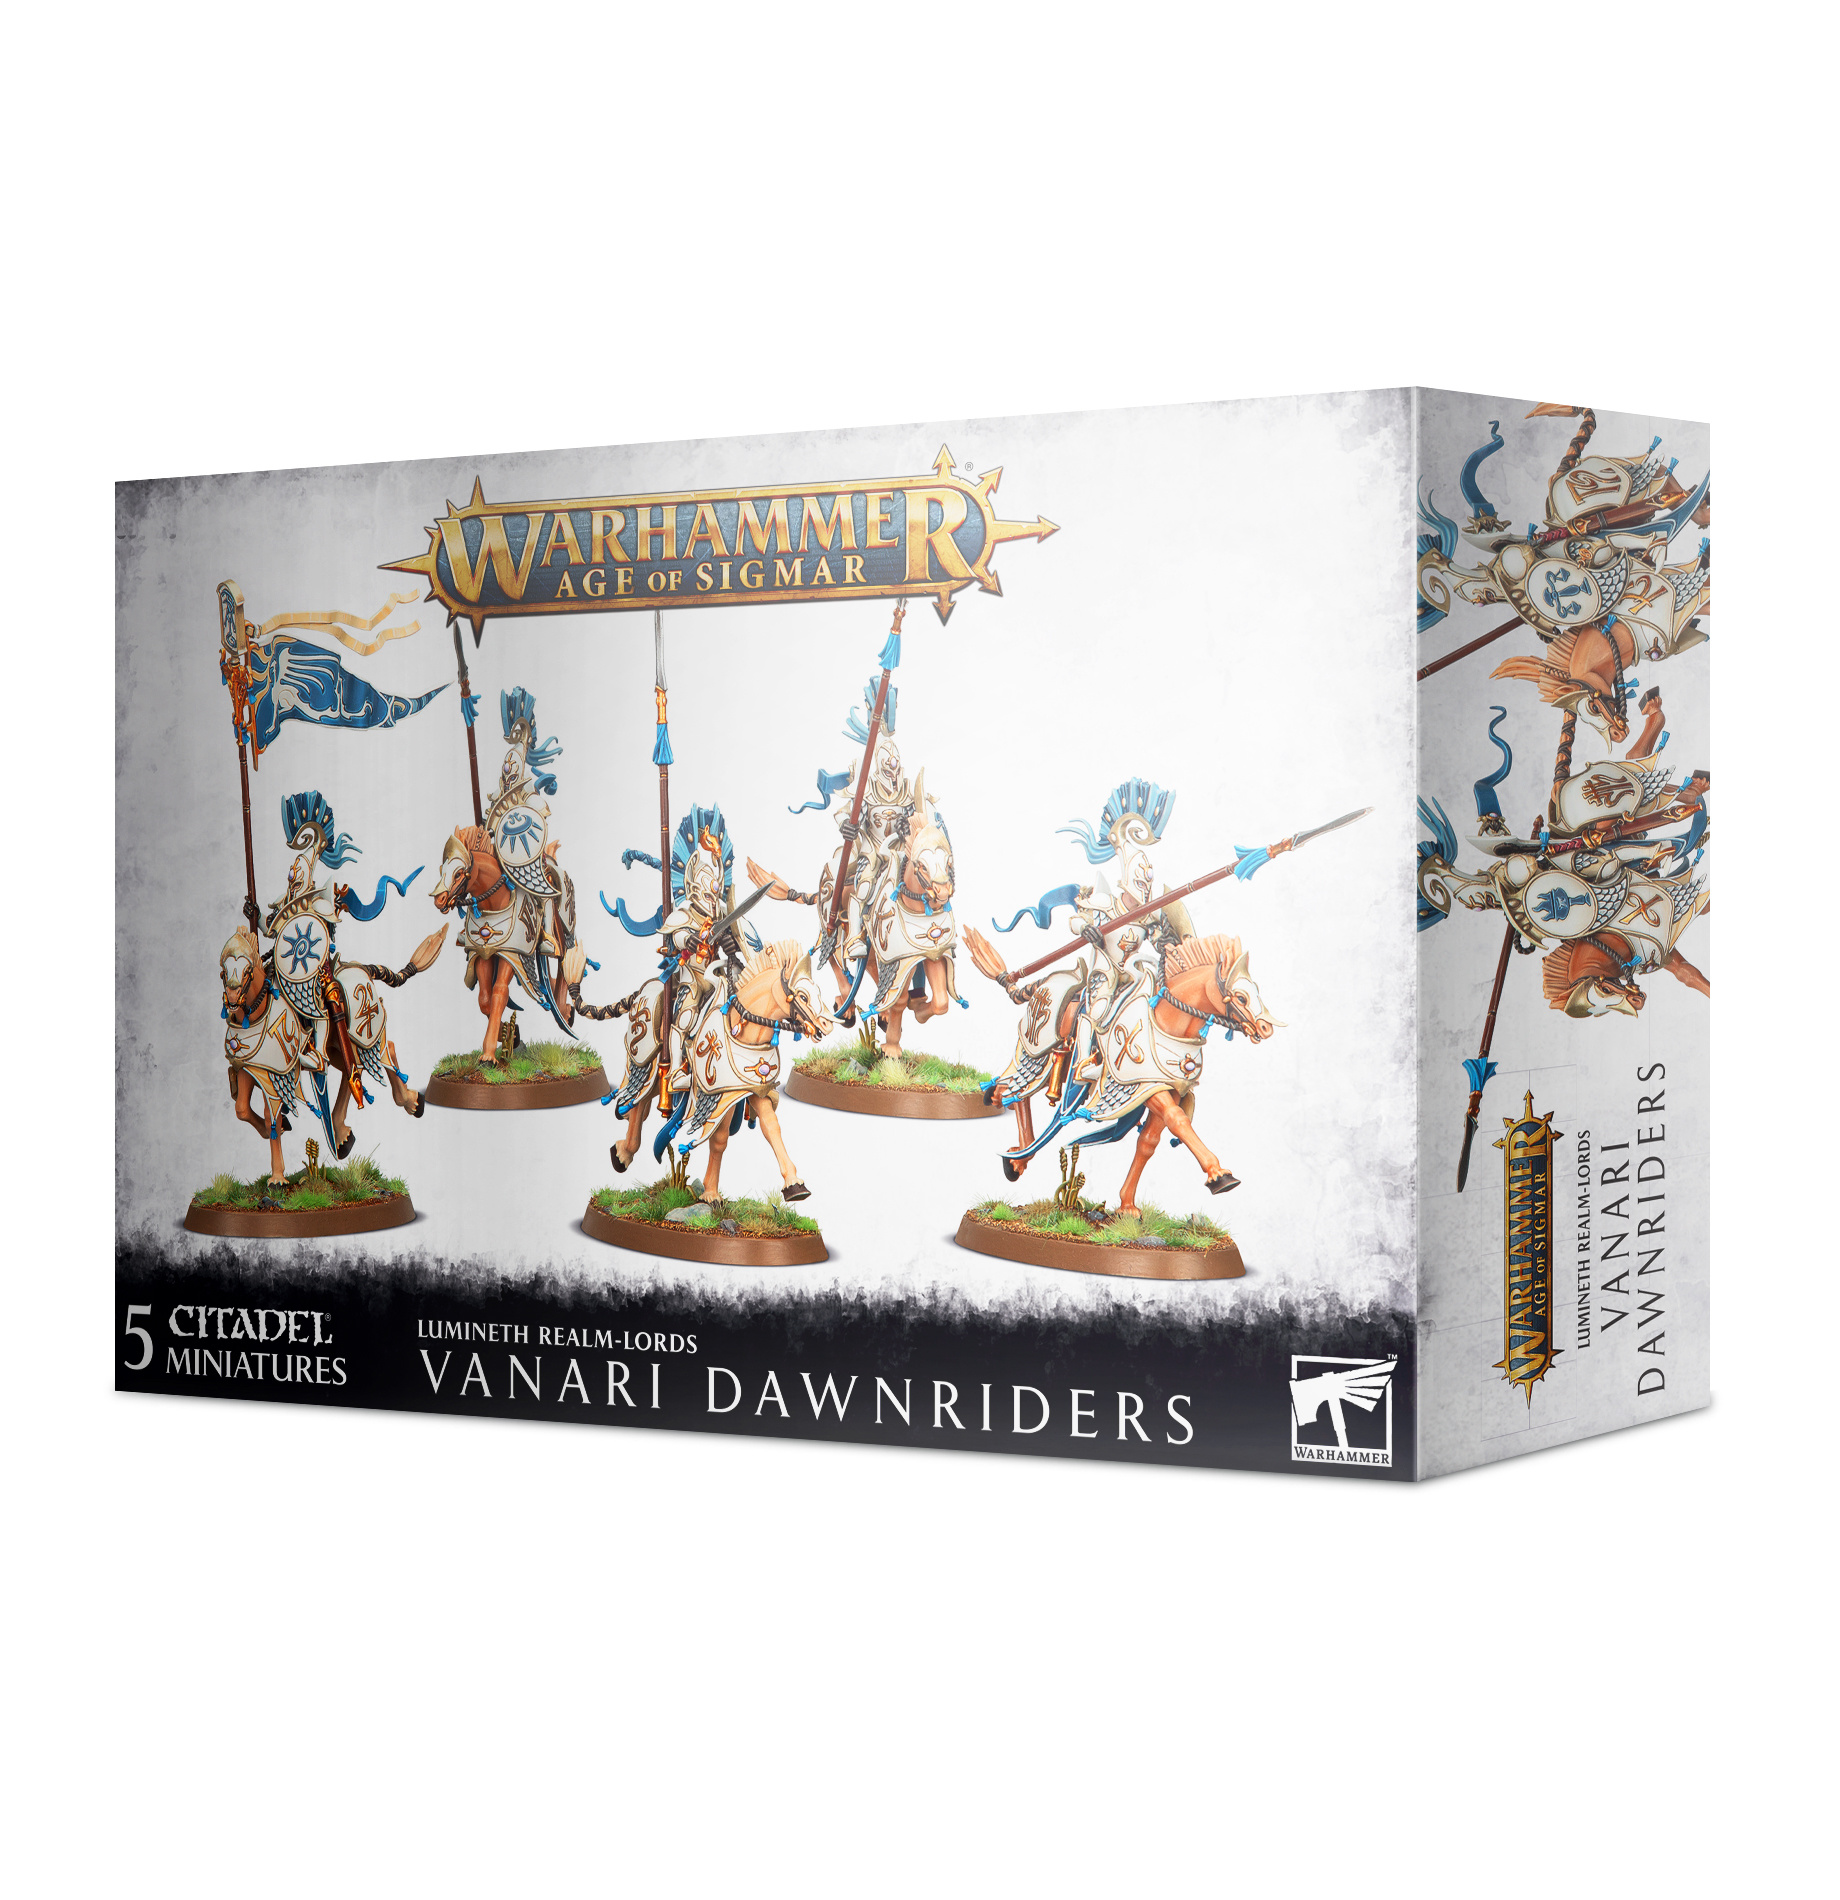 Games-Workshop Lumineth Realm-Lords Vanari Dawnriders